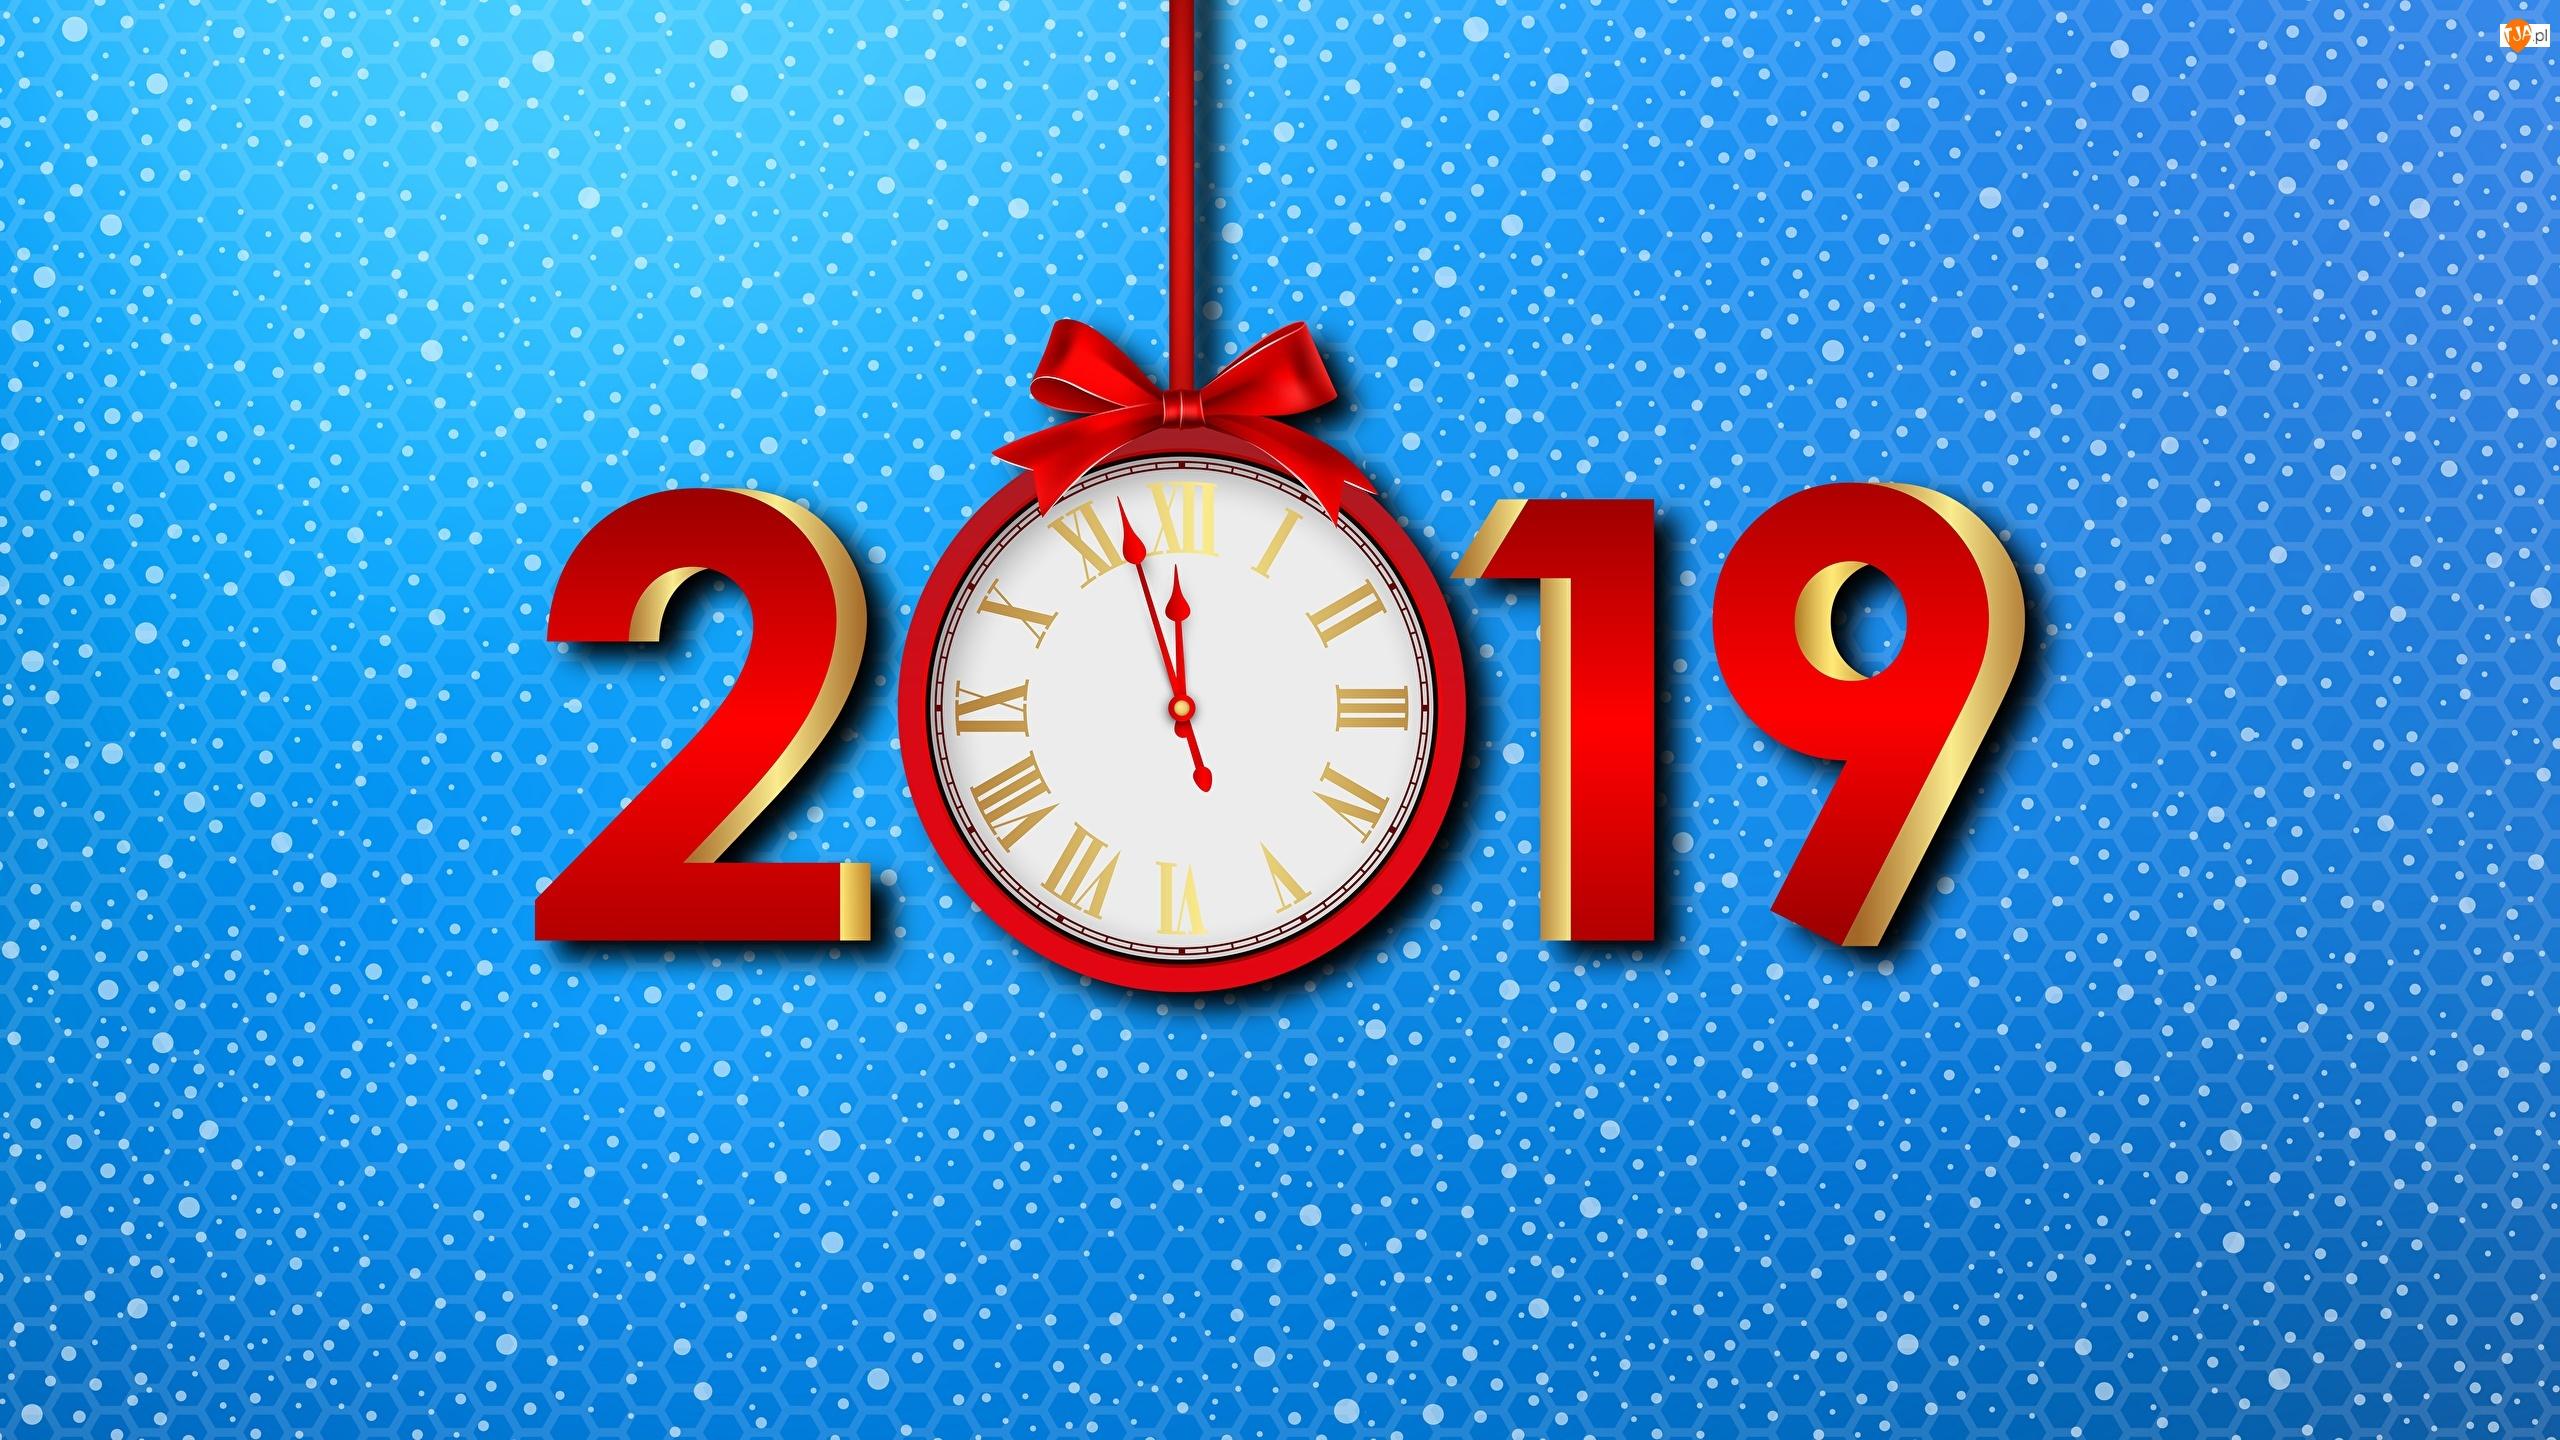 2019, Kokarda, Nowy Rok, Zegar, Czas